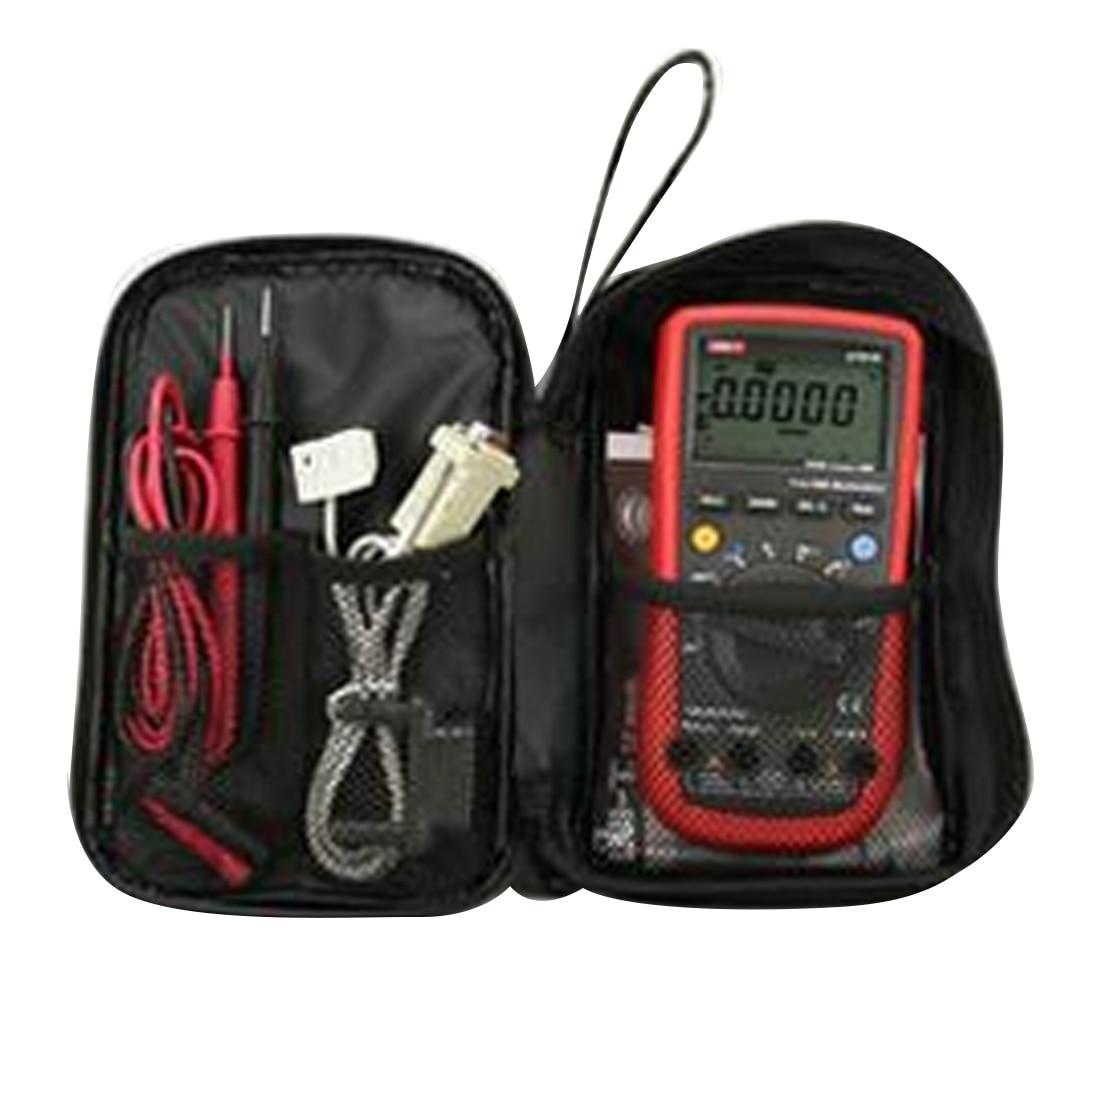 Durable  Waterproof Tools Bag Multimeter Black Canvas Bag For UT61 Series Digital Multimeter Cloth 20*12*4cm